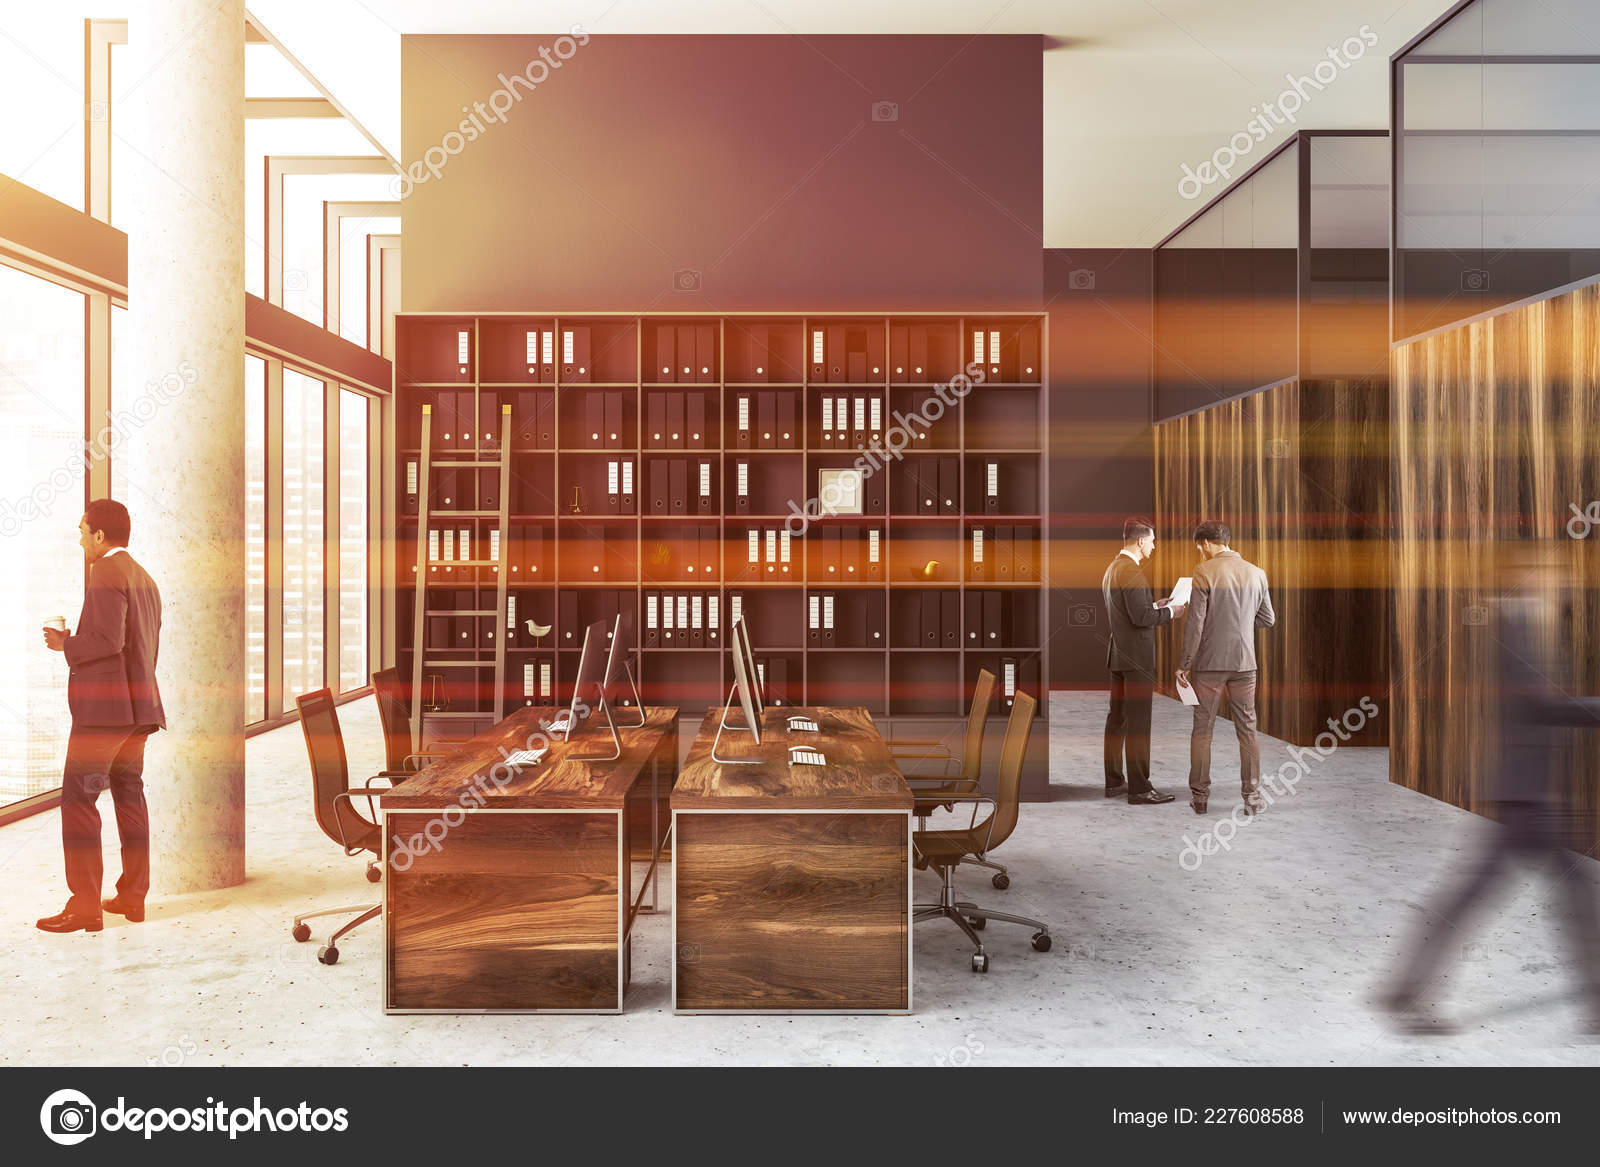 People Modern Office Gray Walls Concrete Floor Wooden